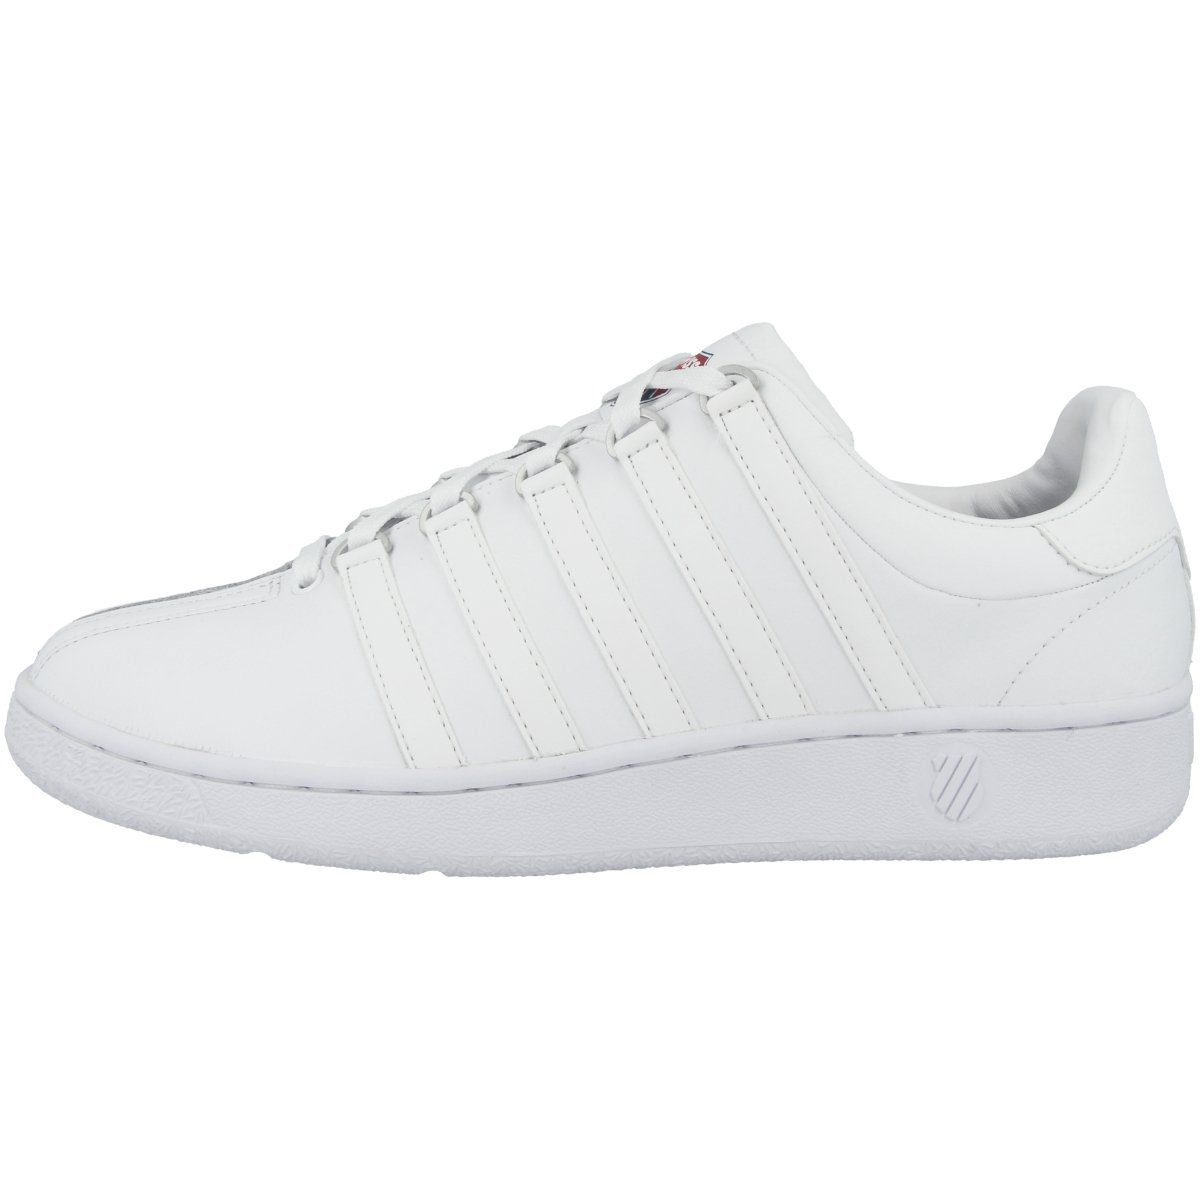 K Swiss »Classic VN Heritage« Sneaker kaufen | OTTO